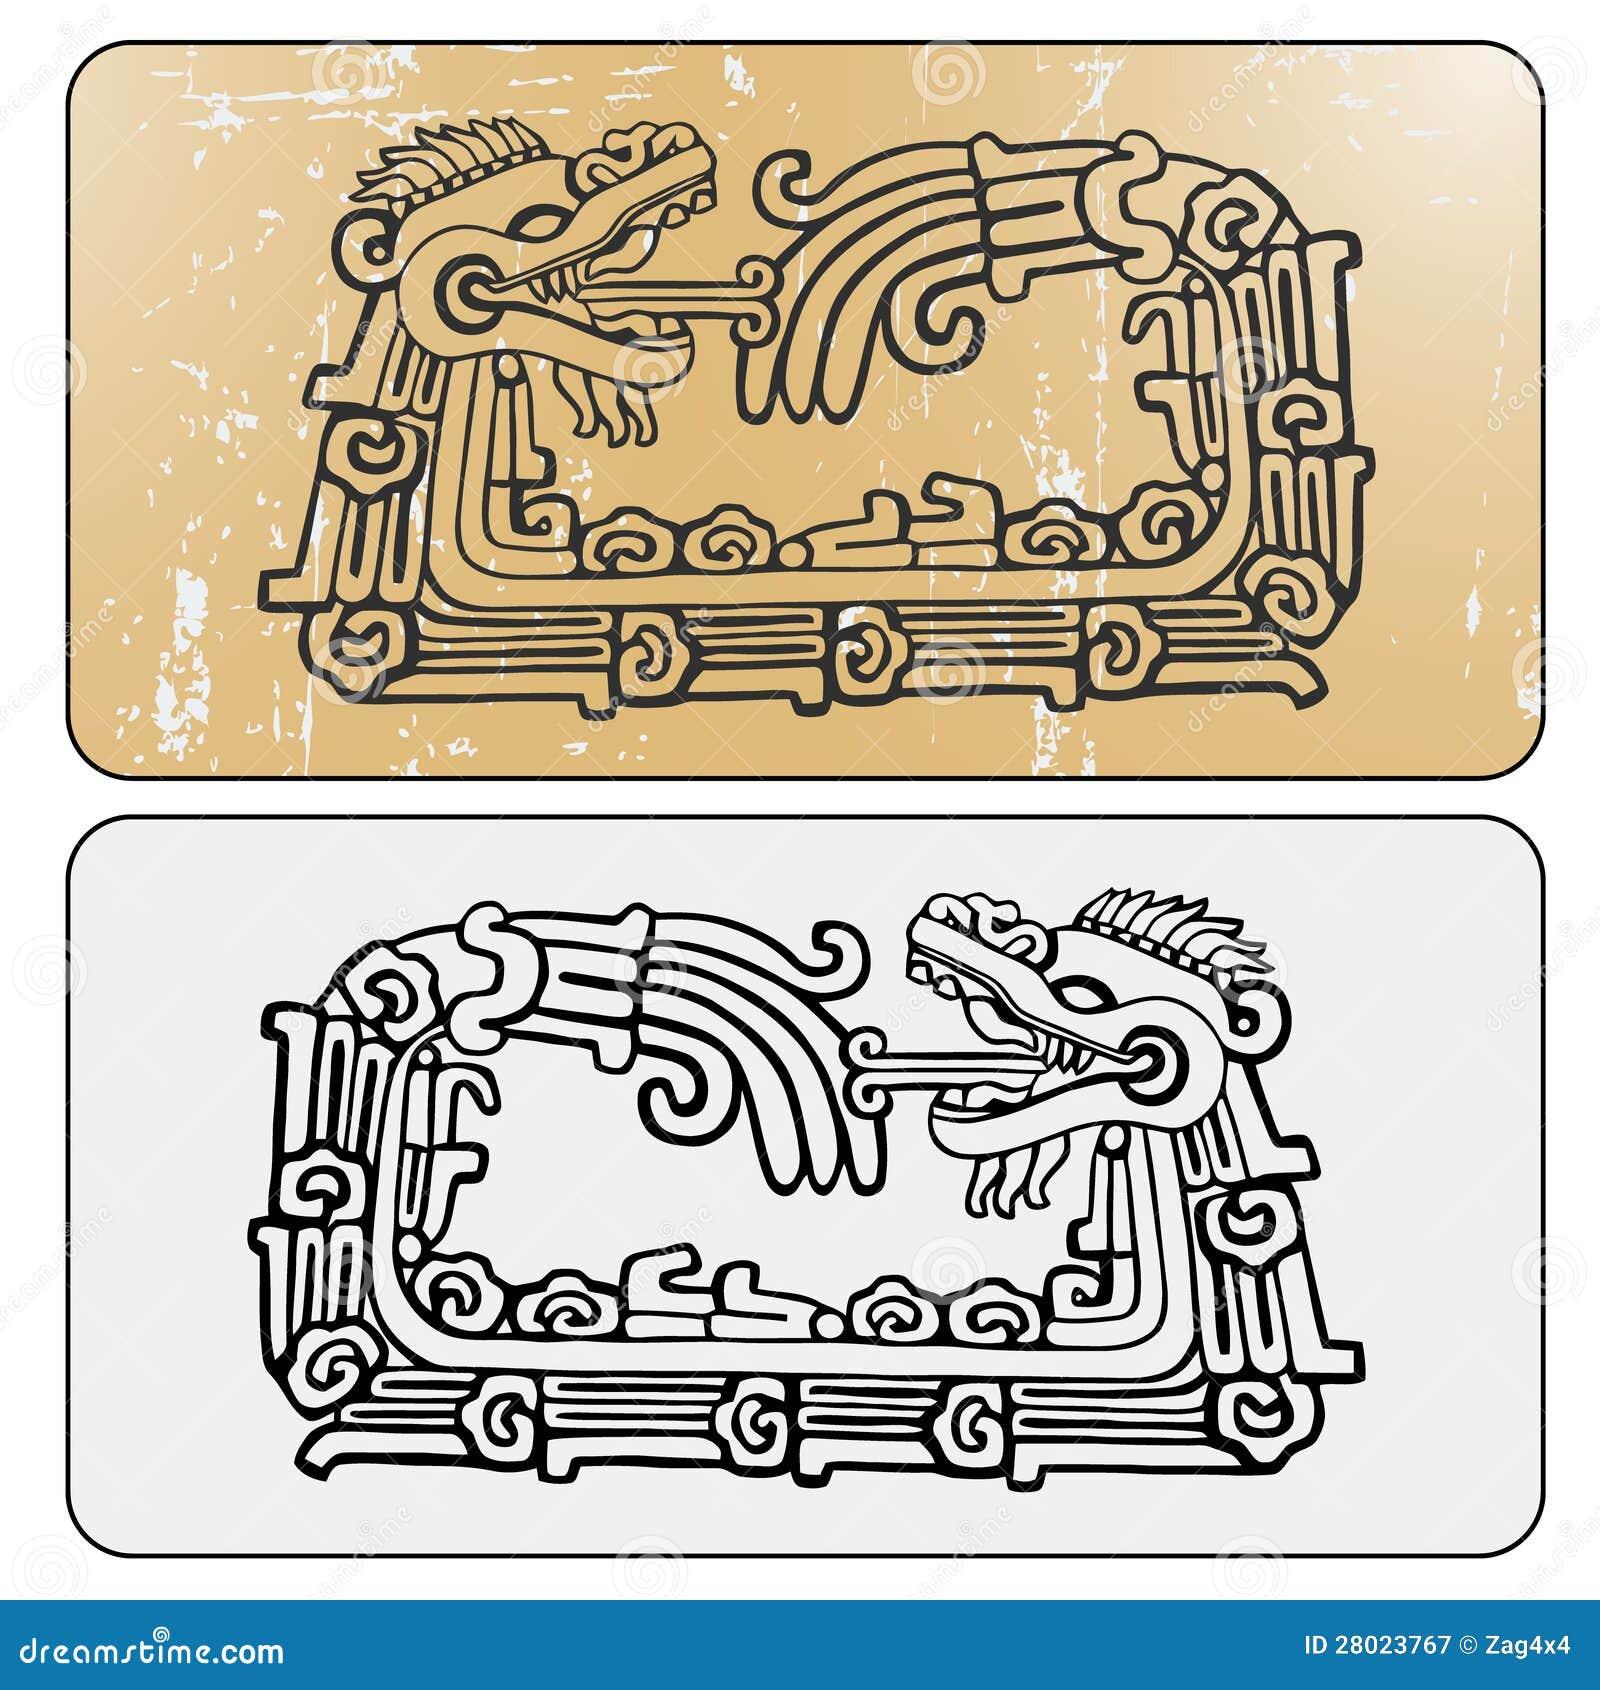 Quetzalcoatl ouroboros, maya symbolic round snake, eating its own tail ...